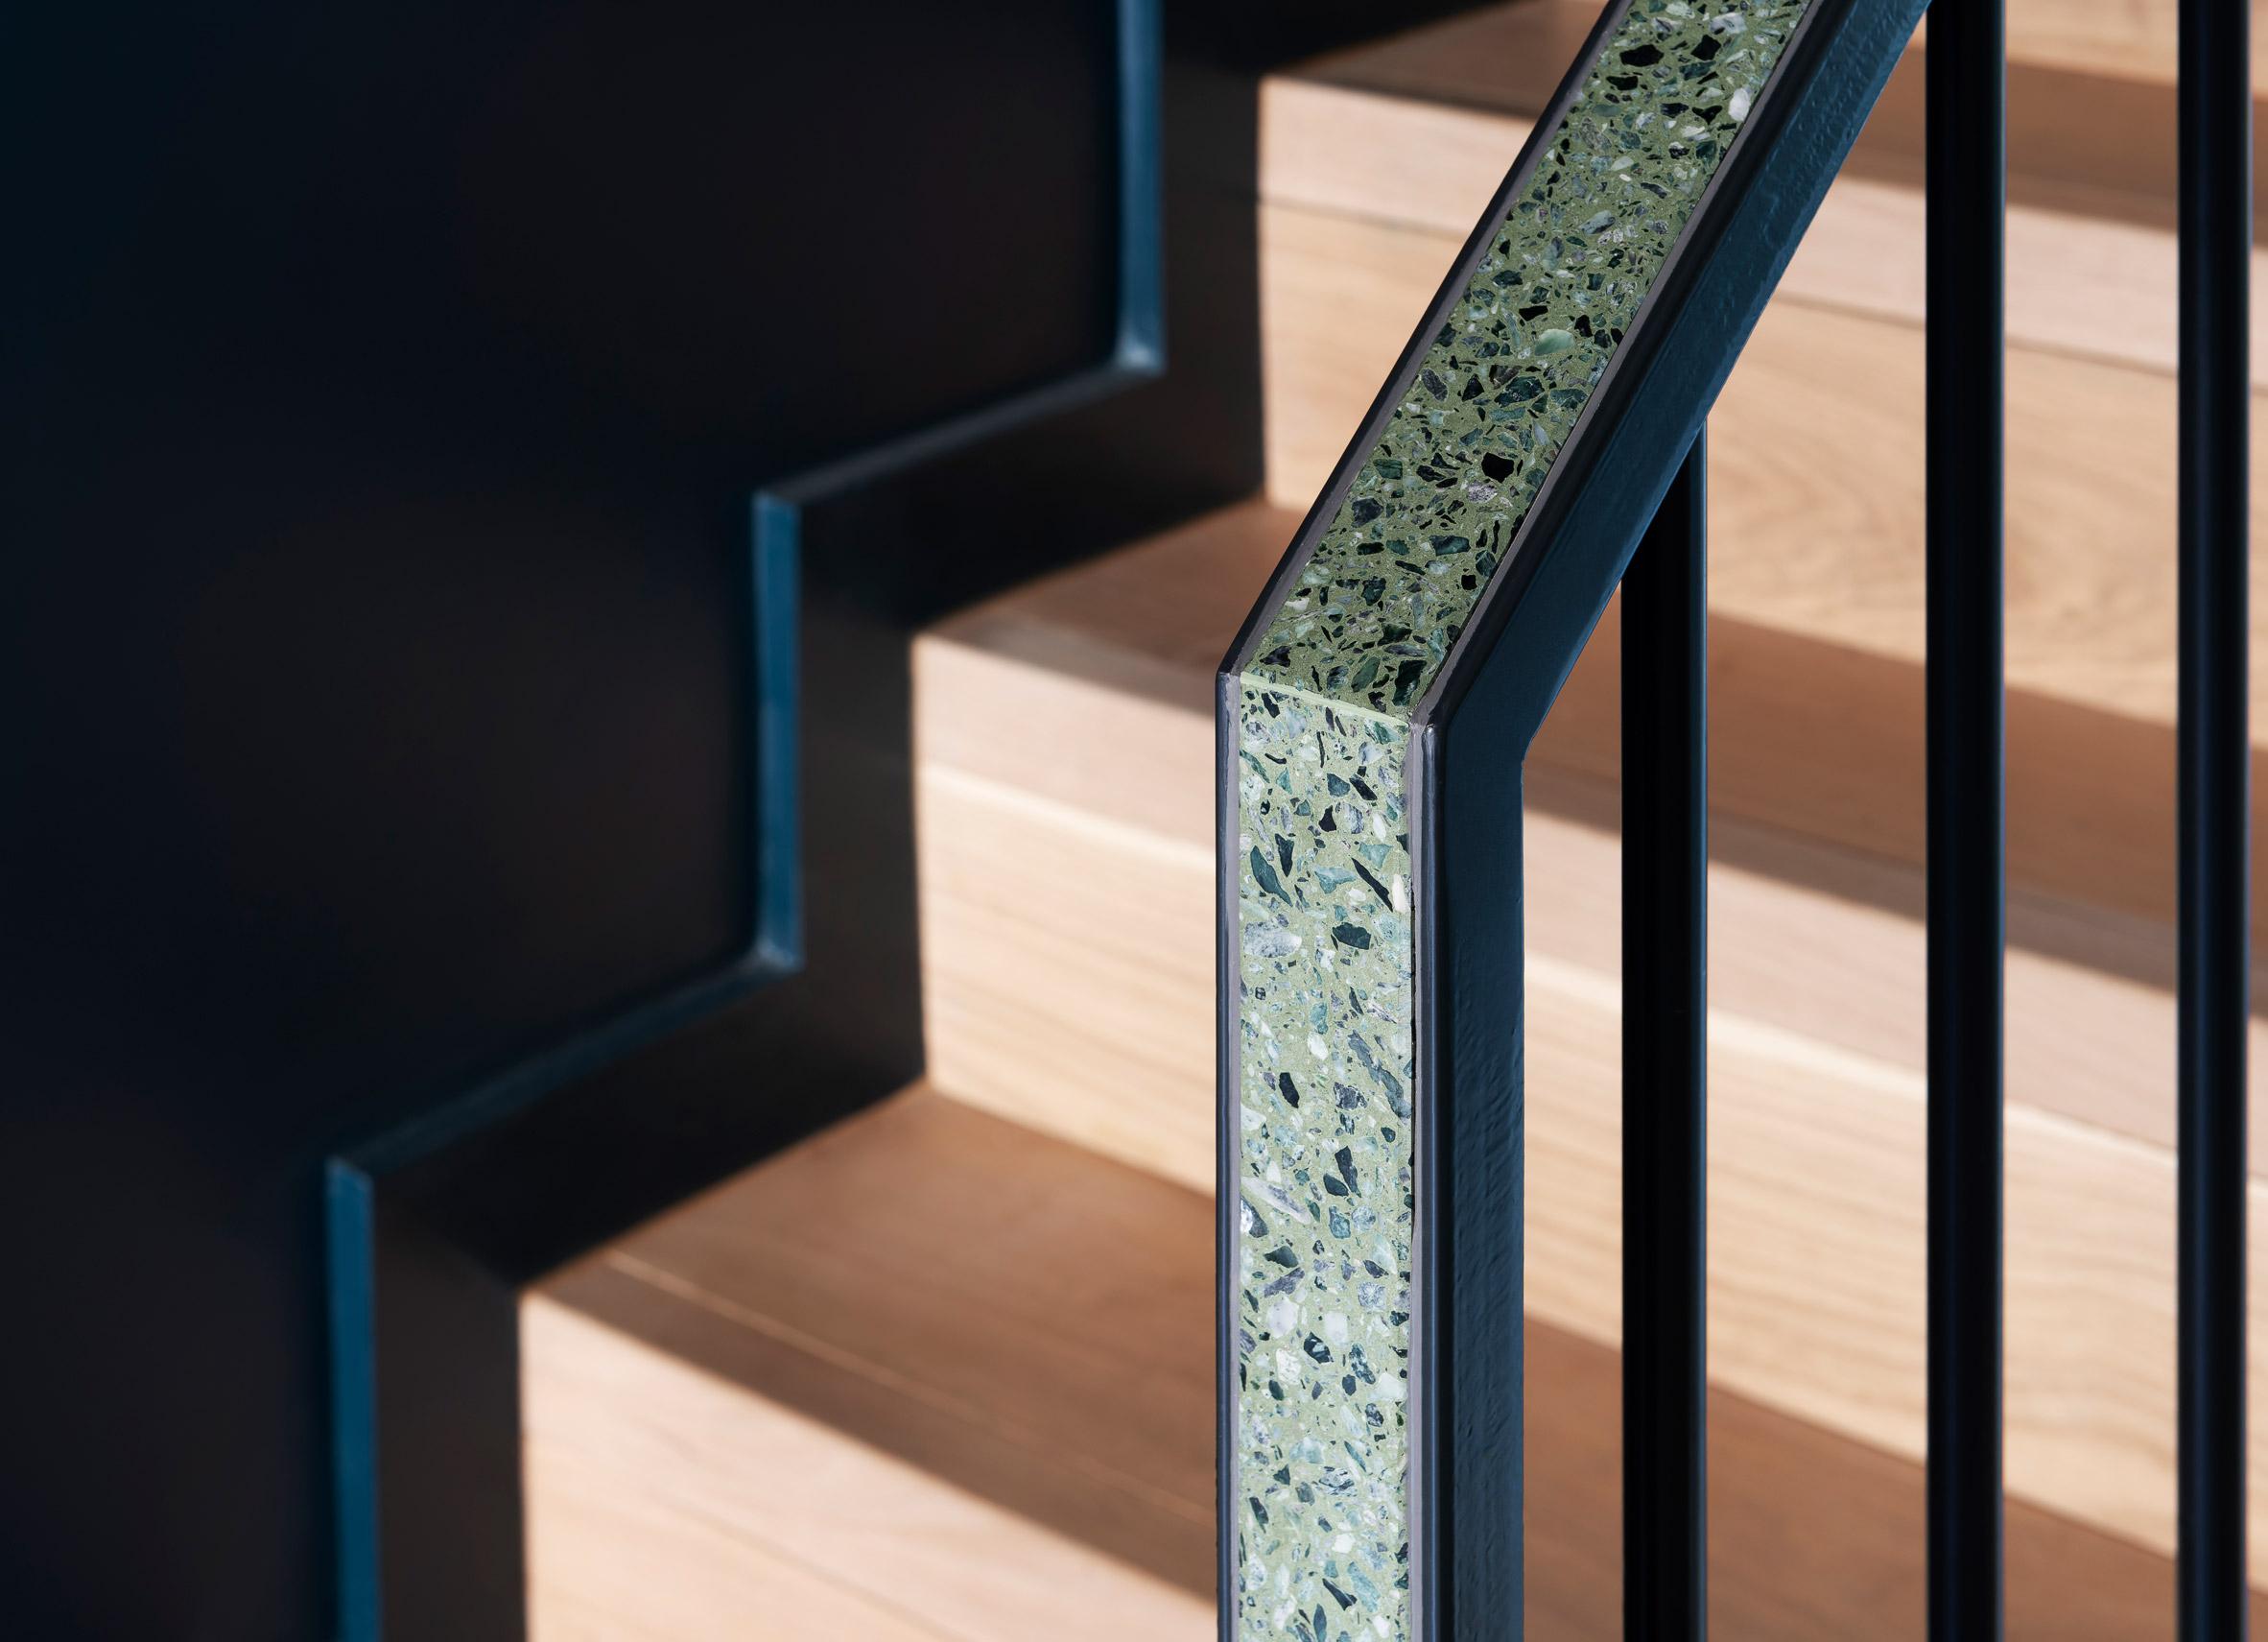 Terrazzo balustrade at Frame House by Bureau de Change